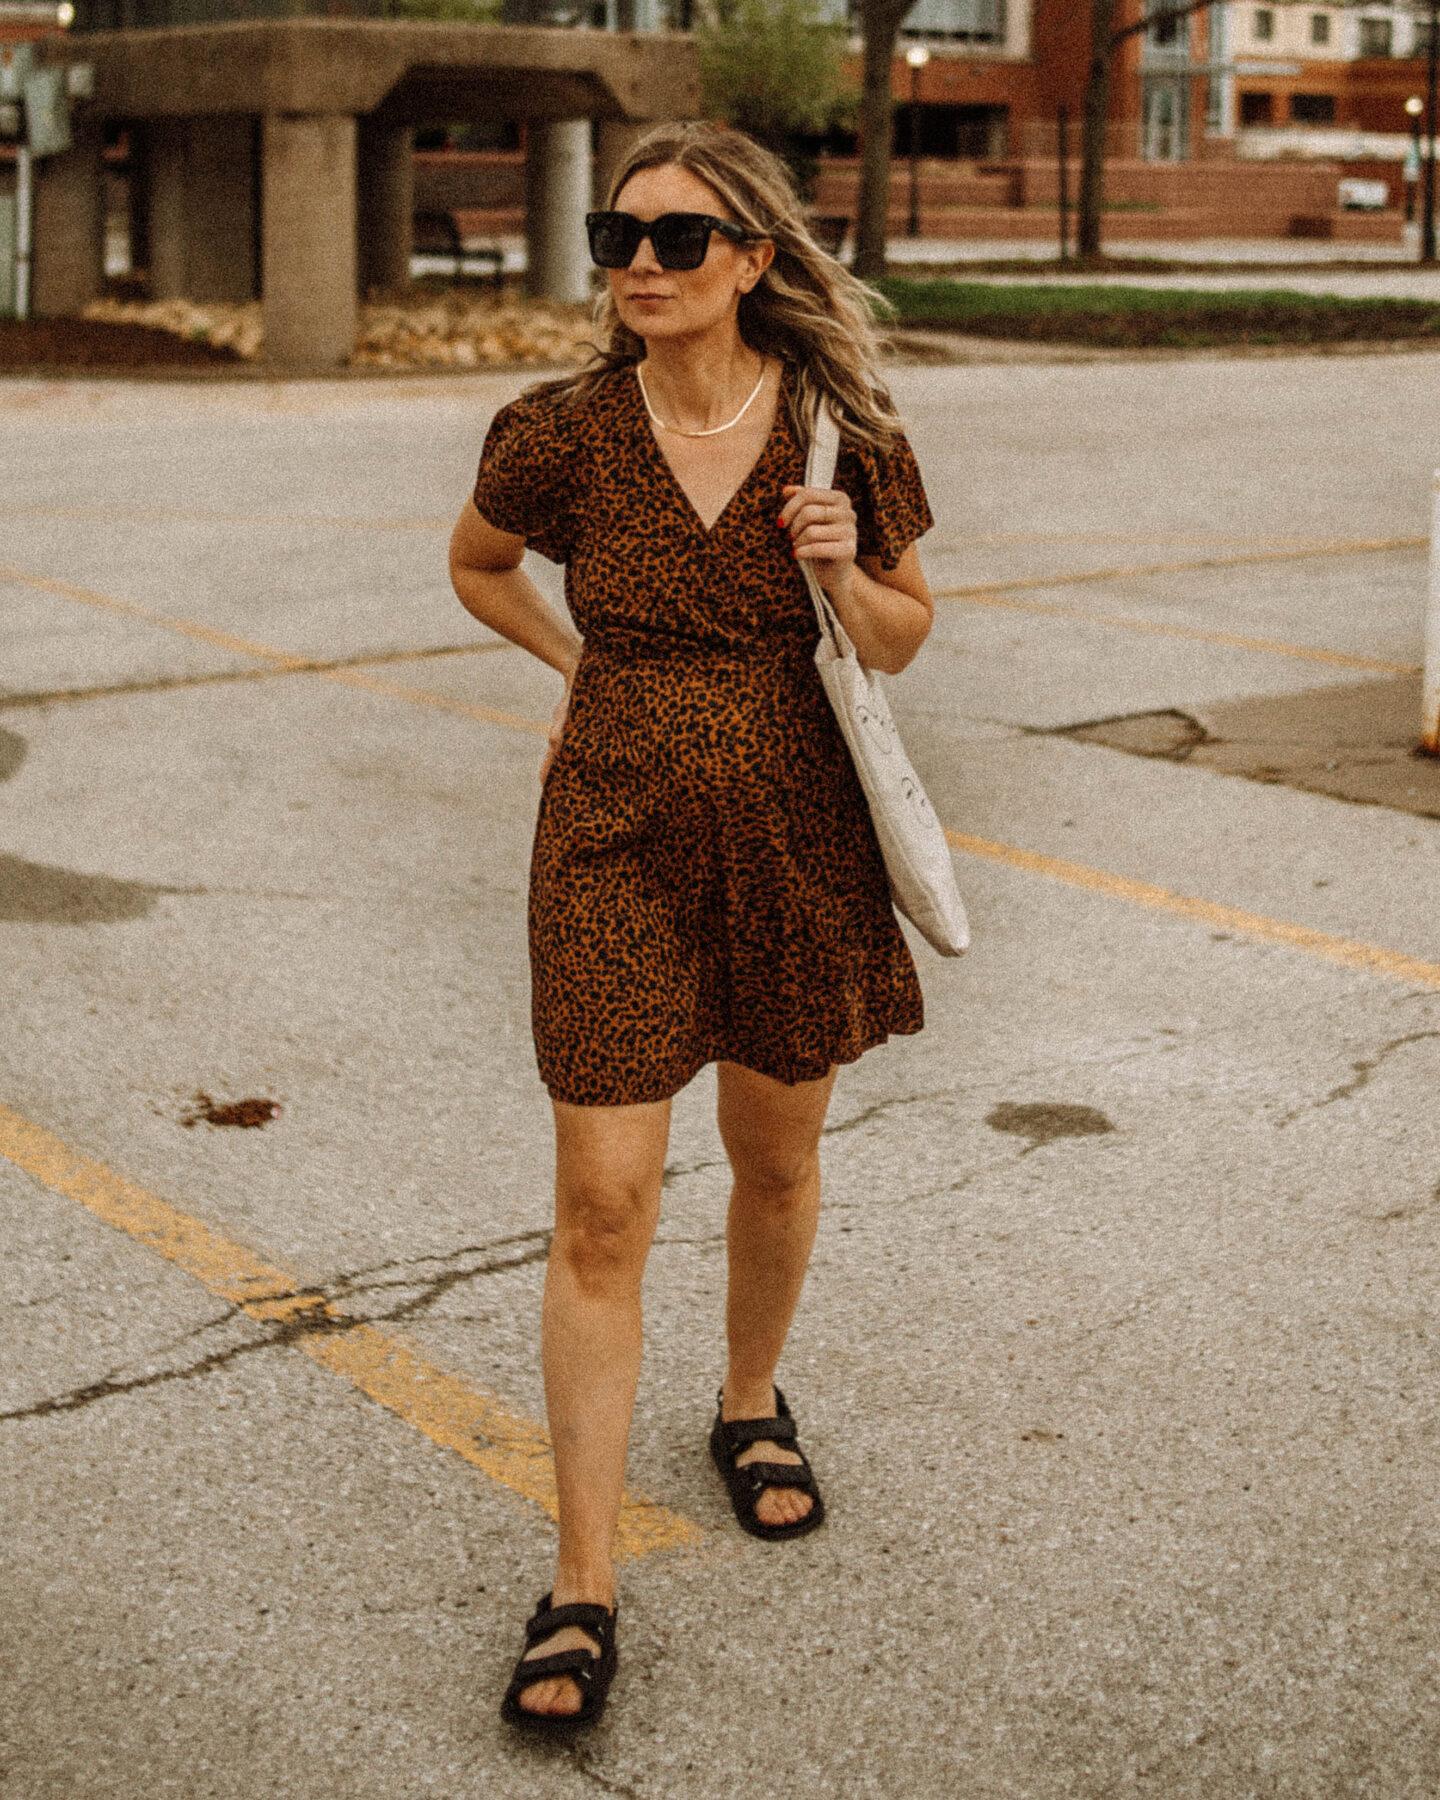 My Favorite Summer Dresses + How I'm Styling Them, Madewell Dress, leopard print dress